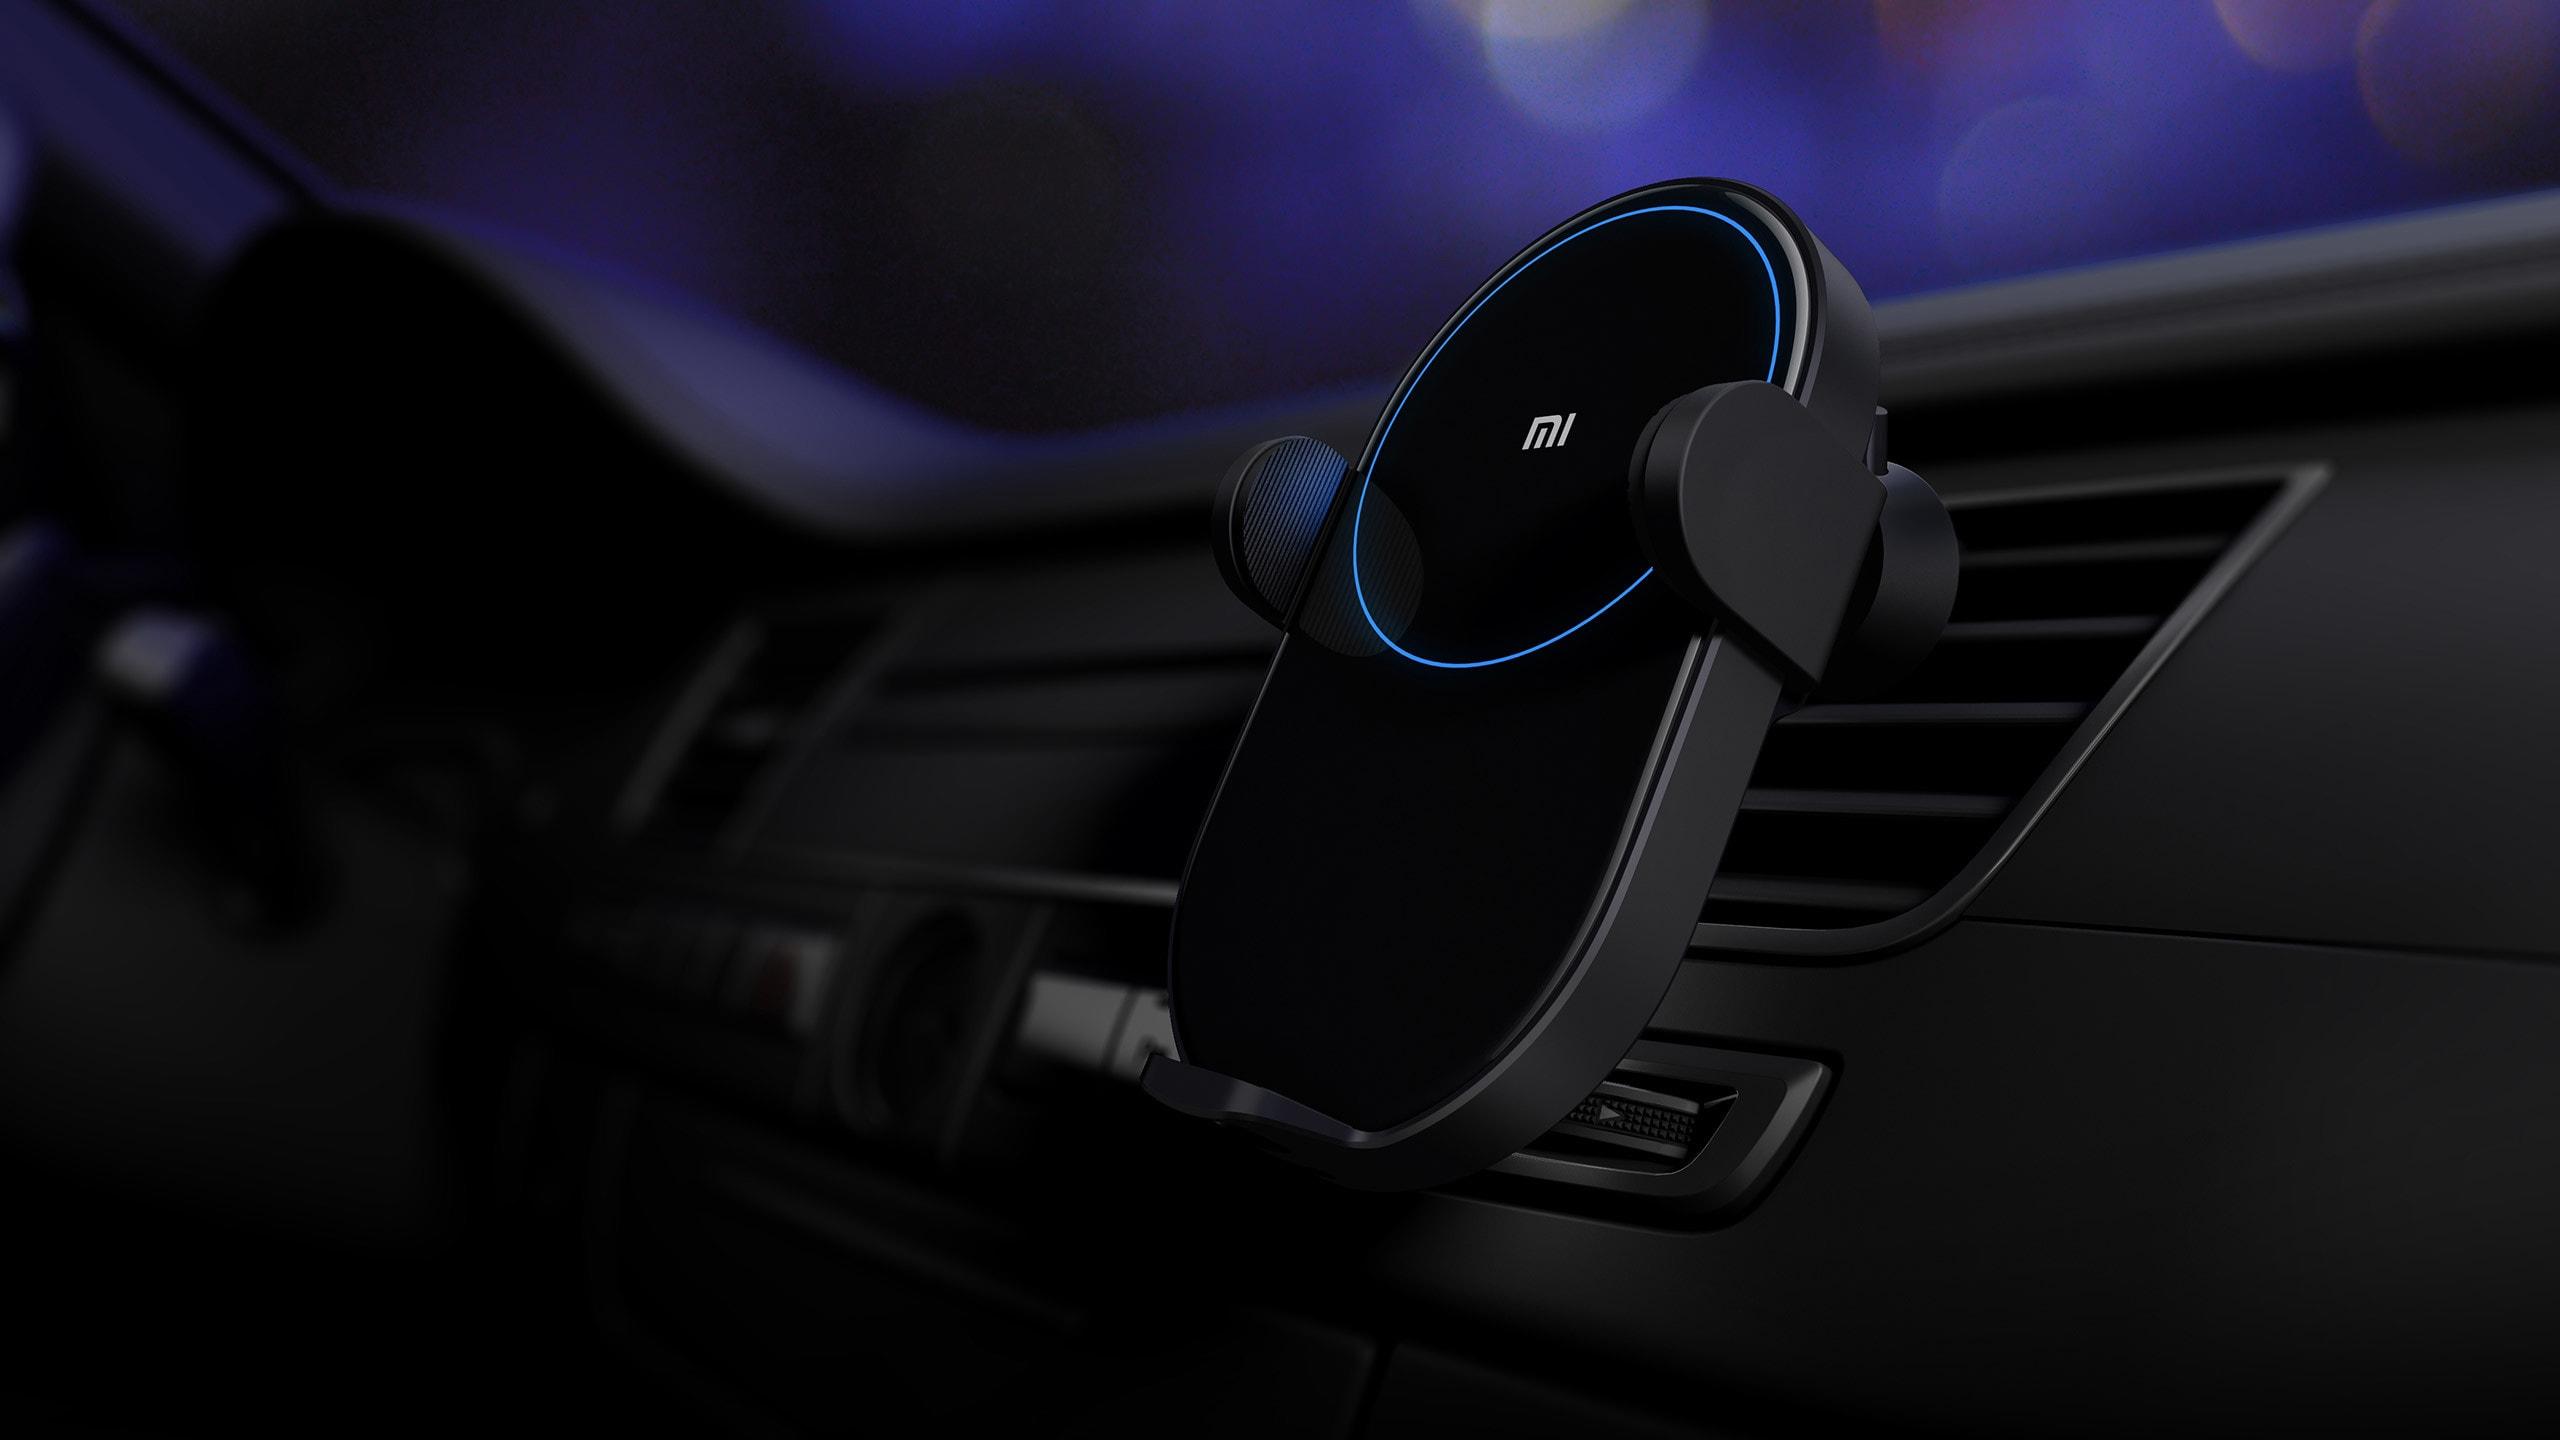 Bezdrôtová nabíjačka do auta s výkonom 20W